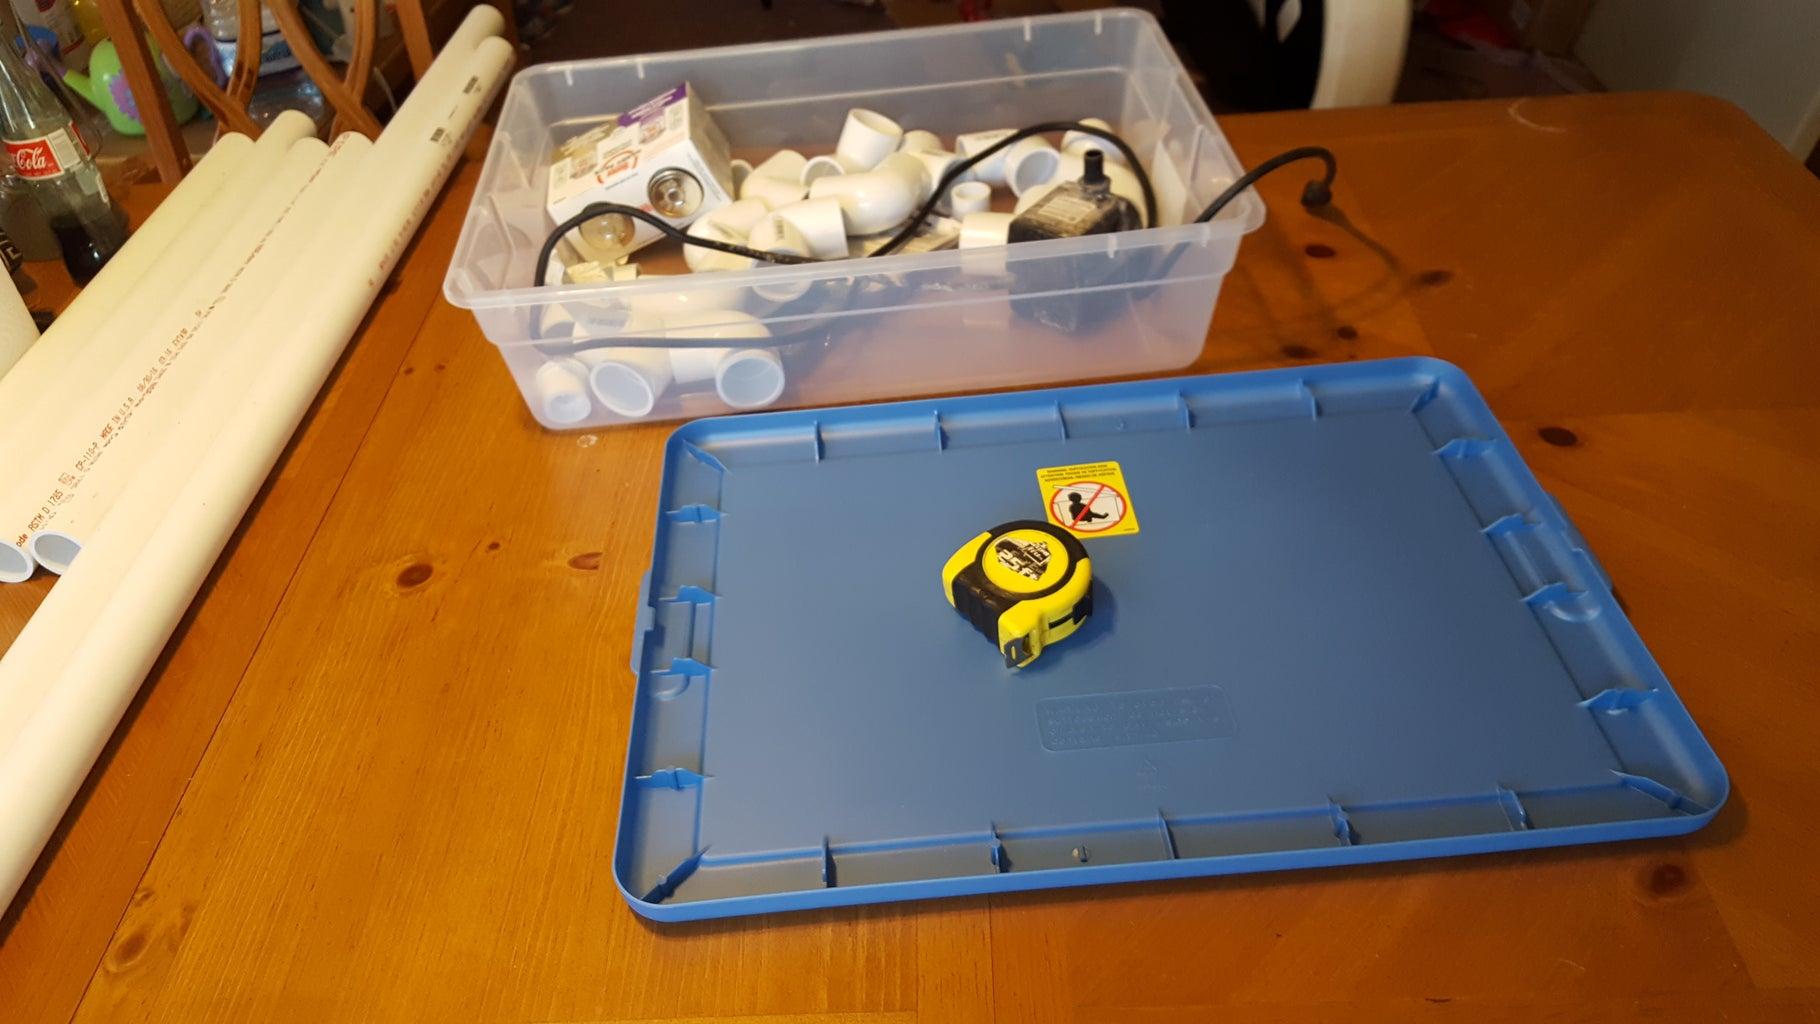 Materials and Setup